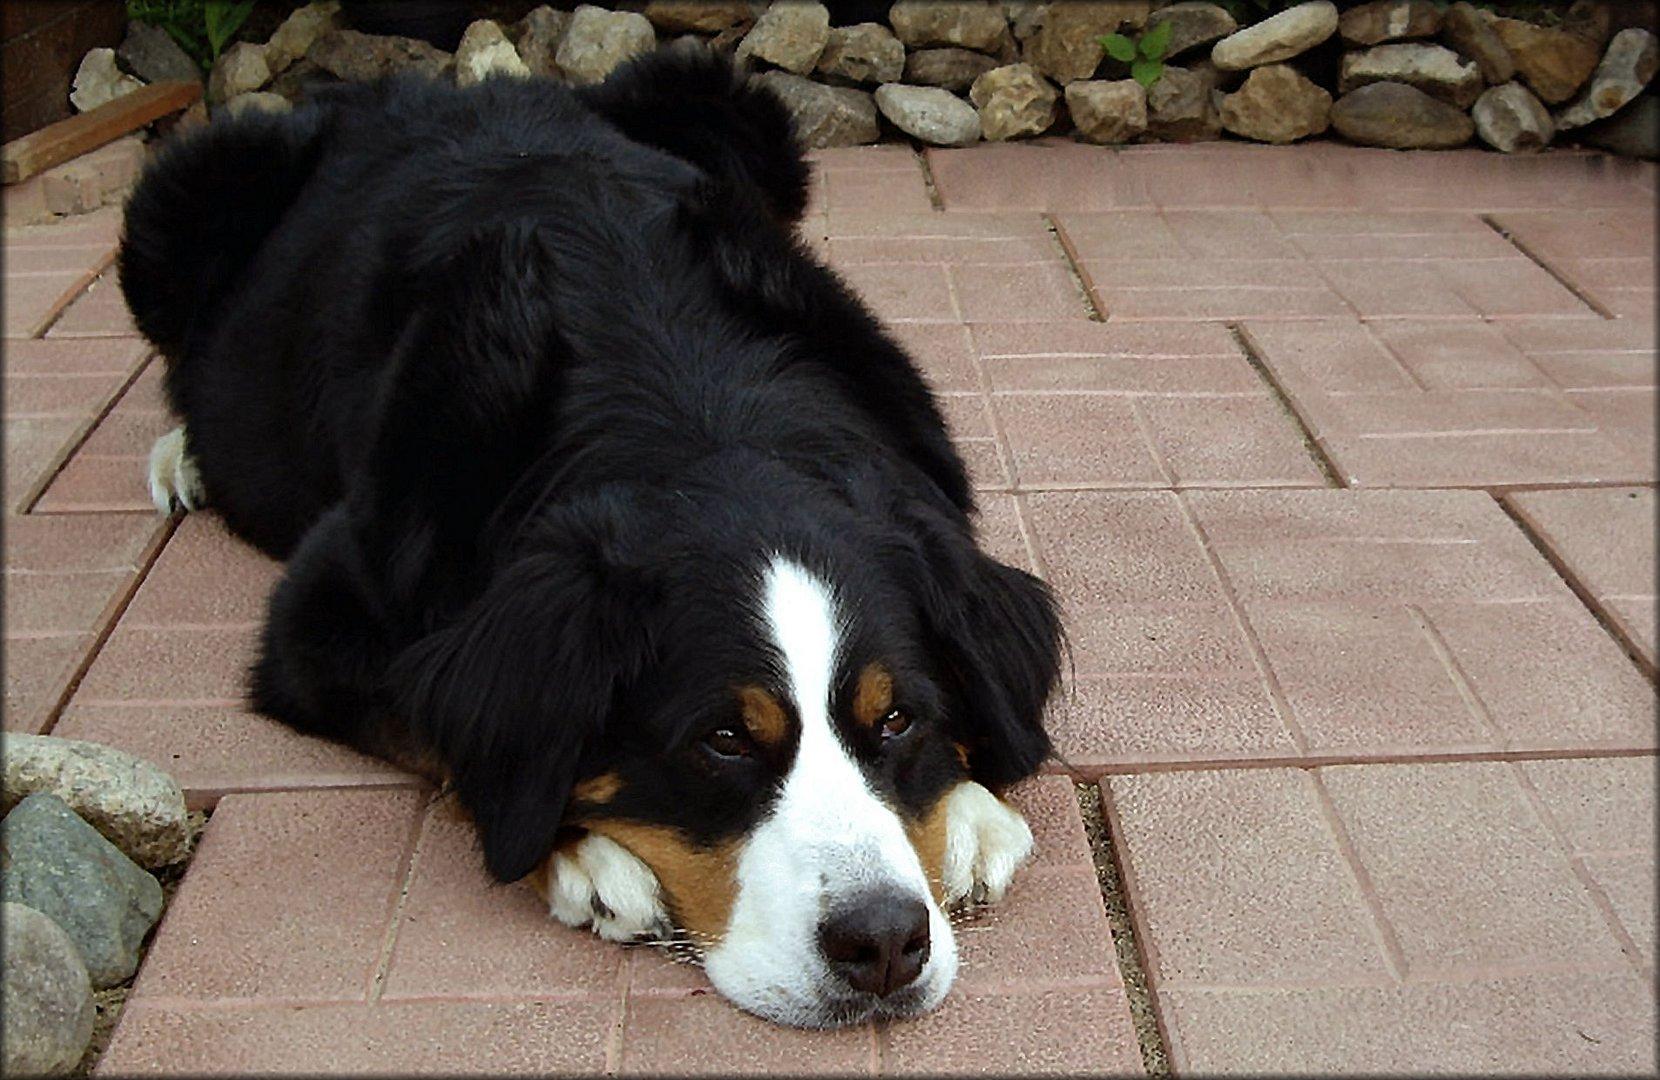 Sweet dog friend of mine.